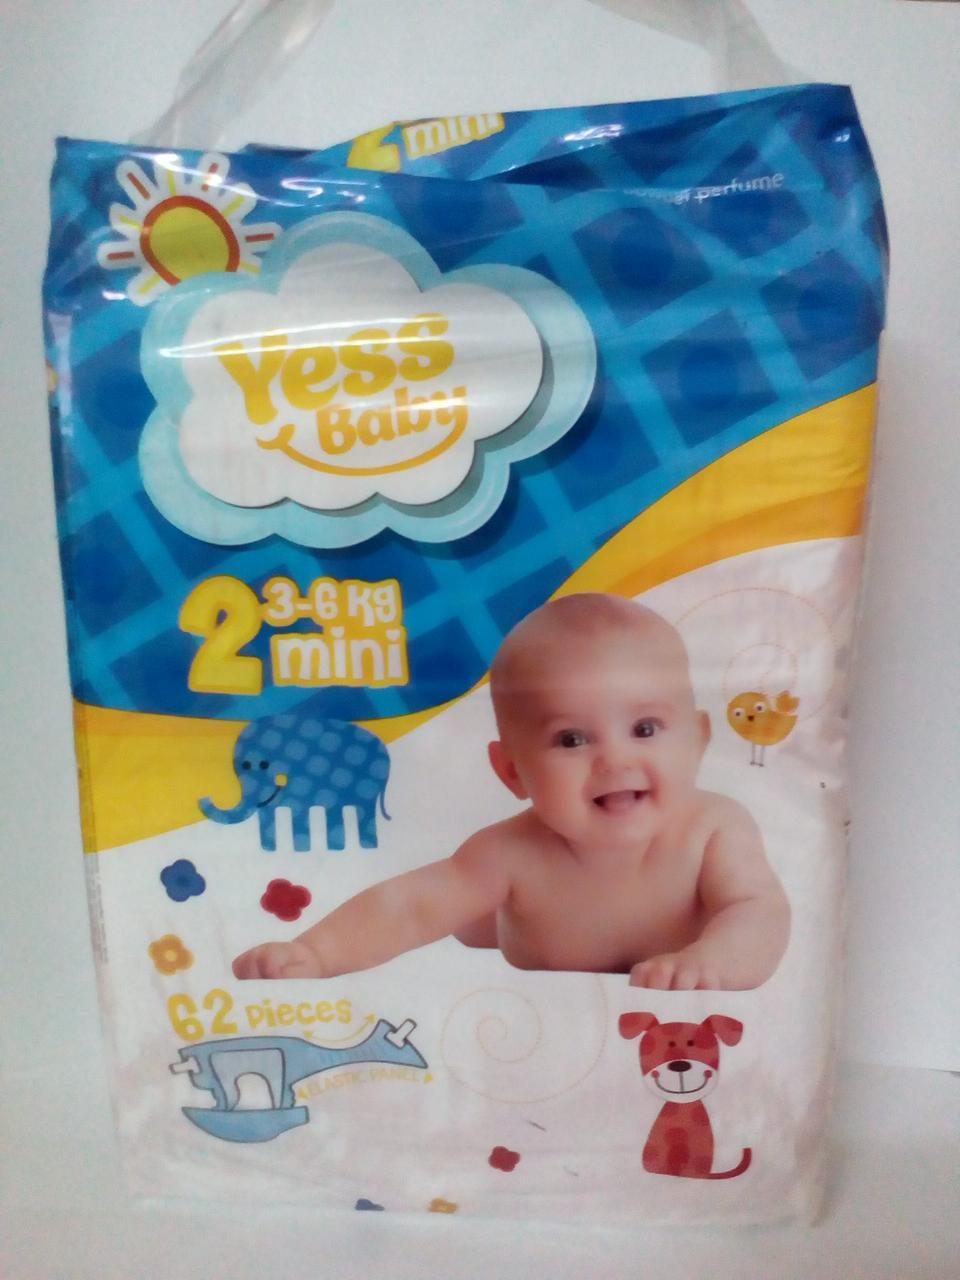 Подгузники Yess Baby Jumbo 2 Mini 3-6кг (62 шт) (4698)